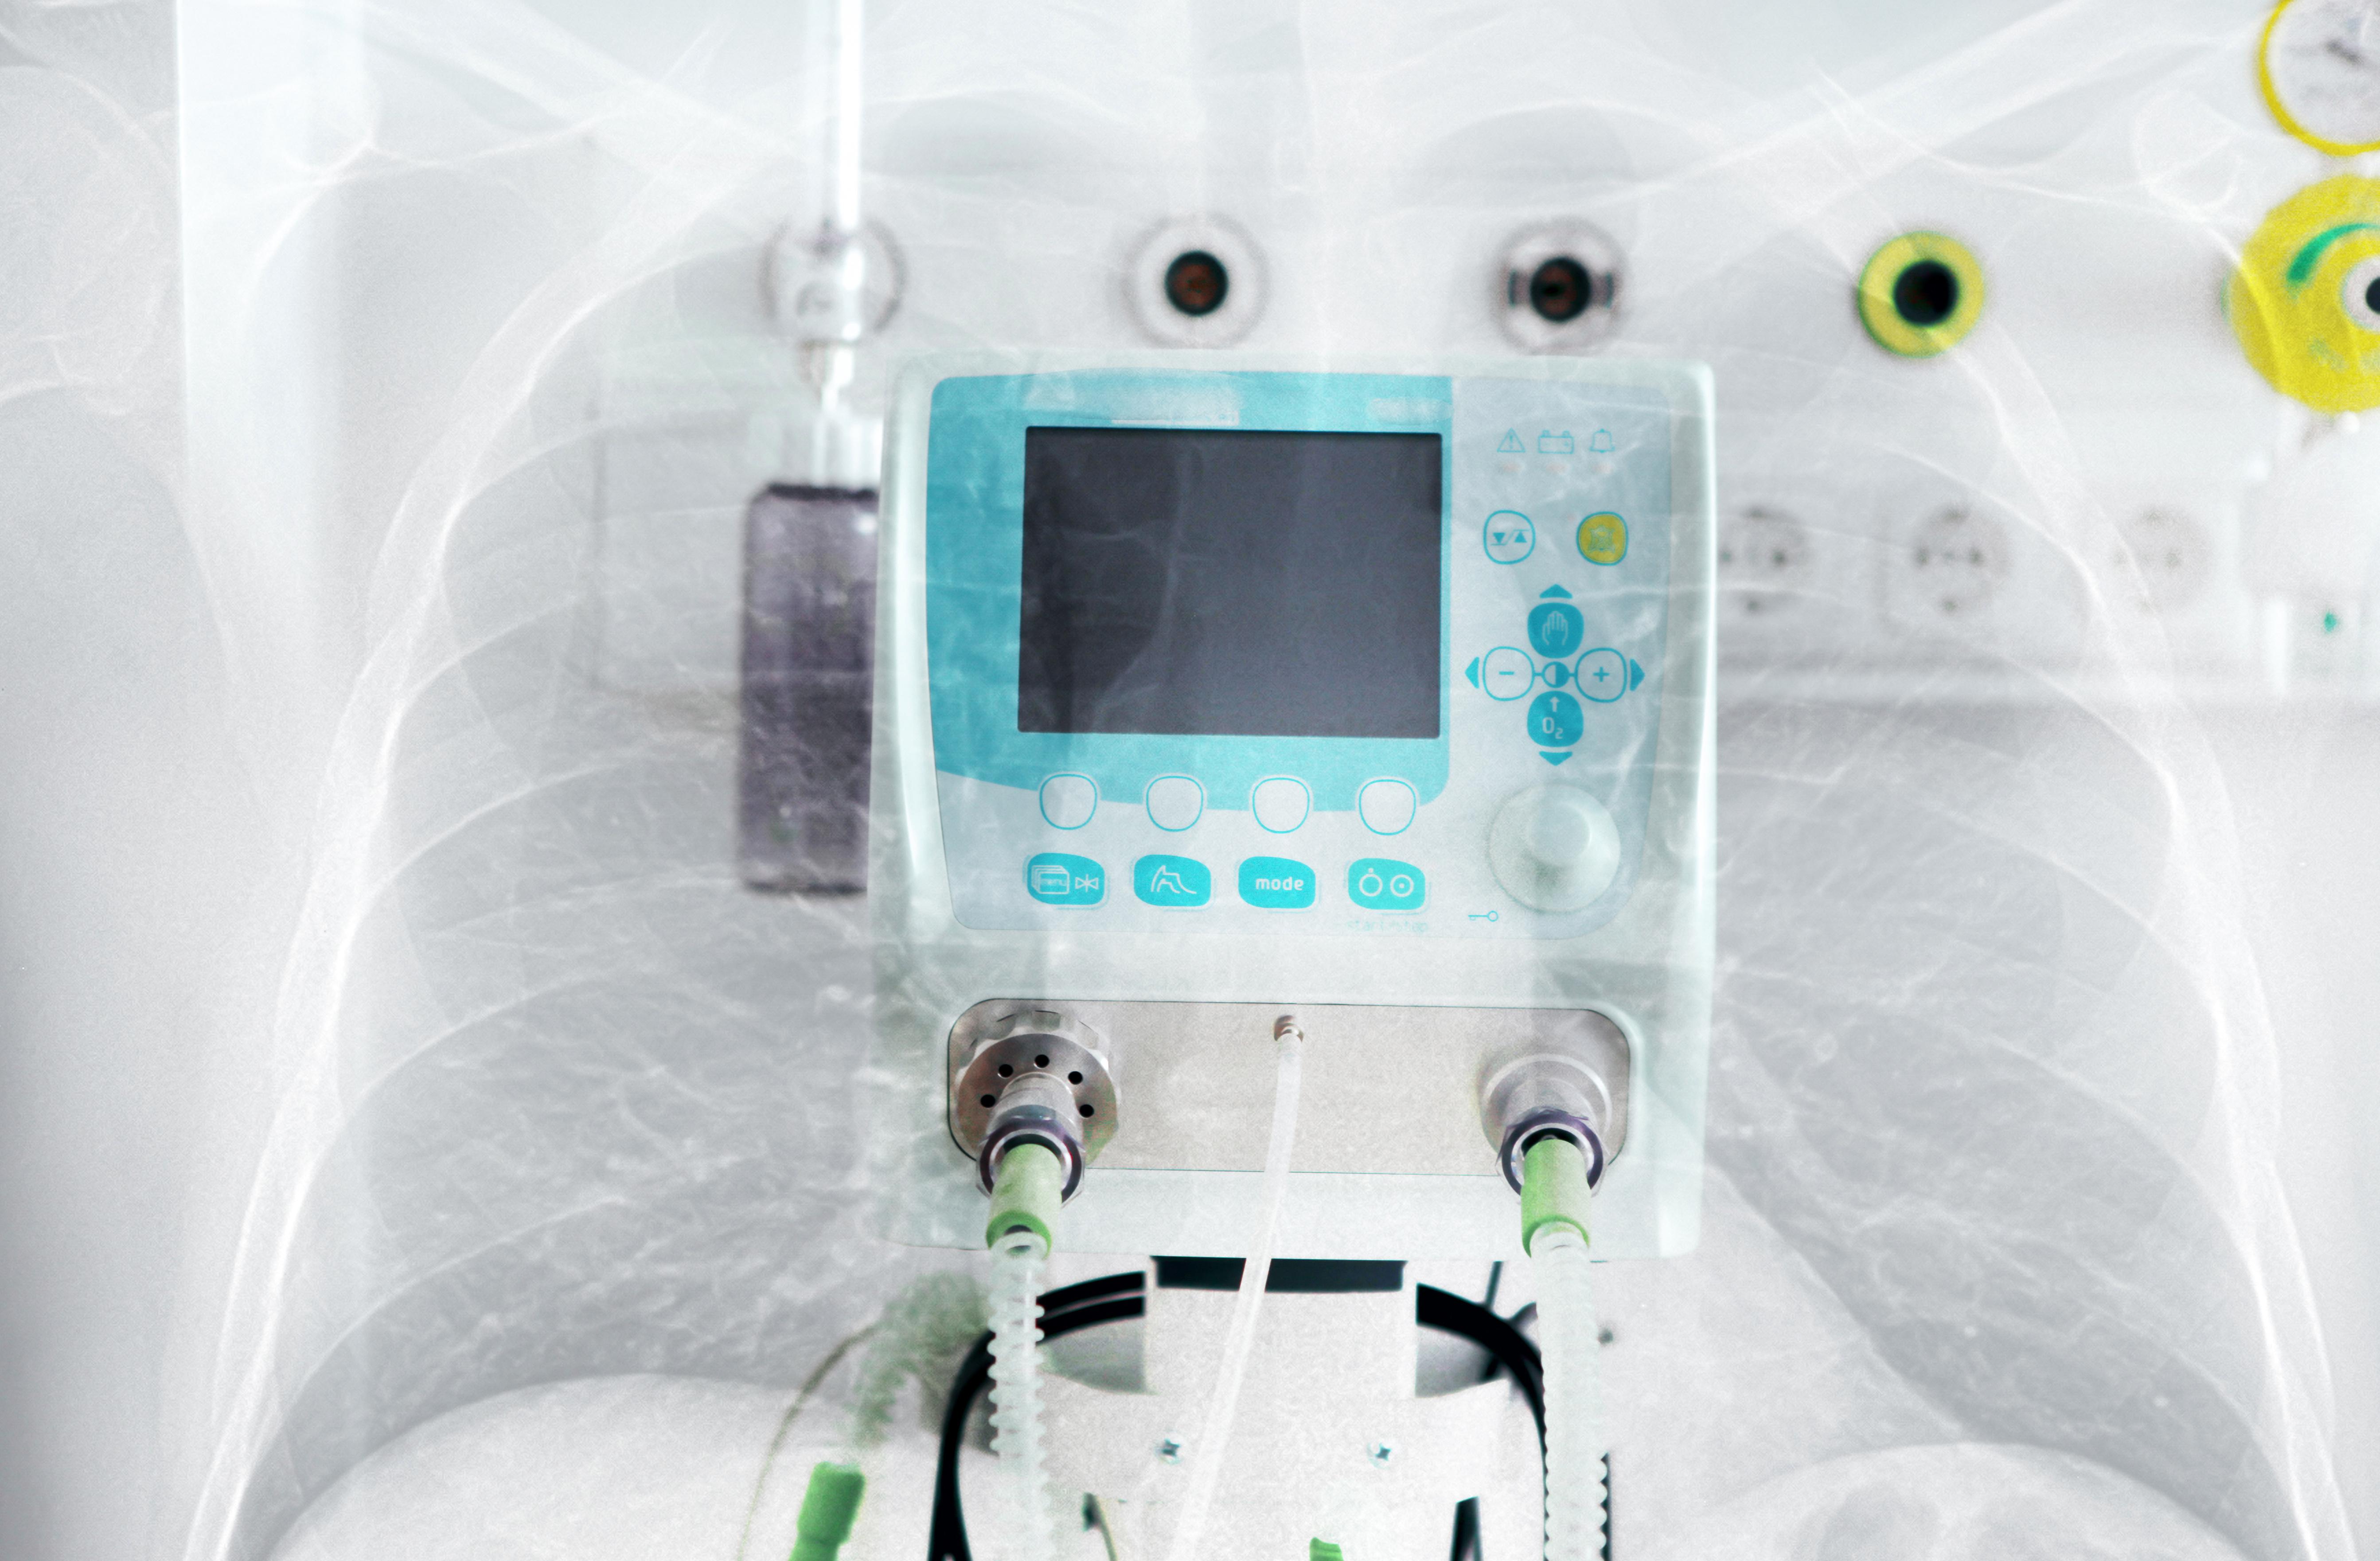 Ventilator machine with lung